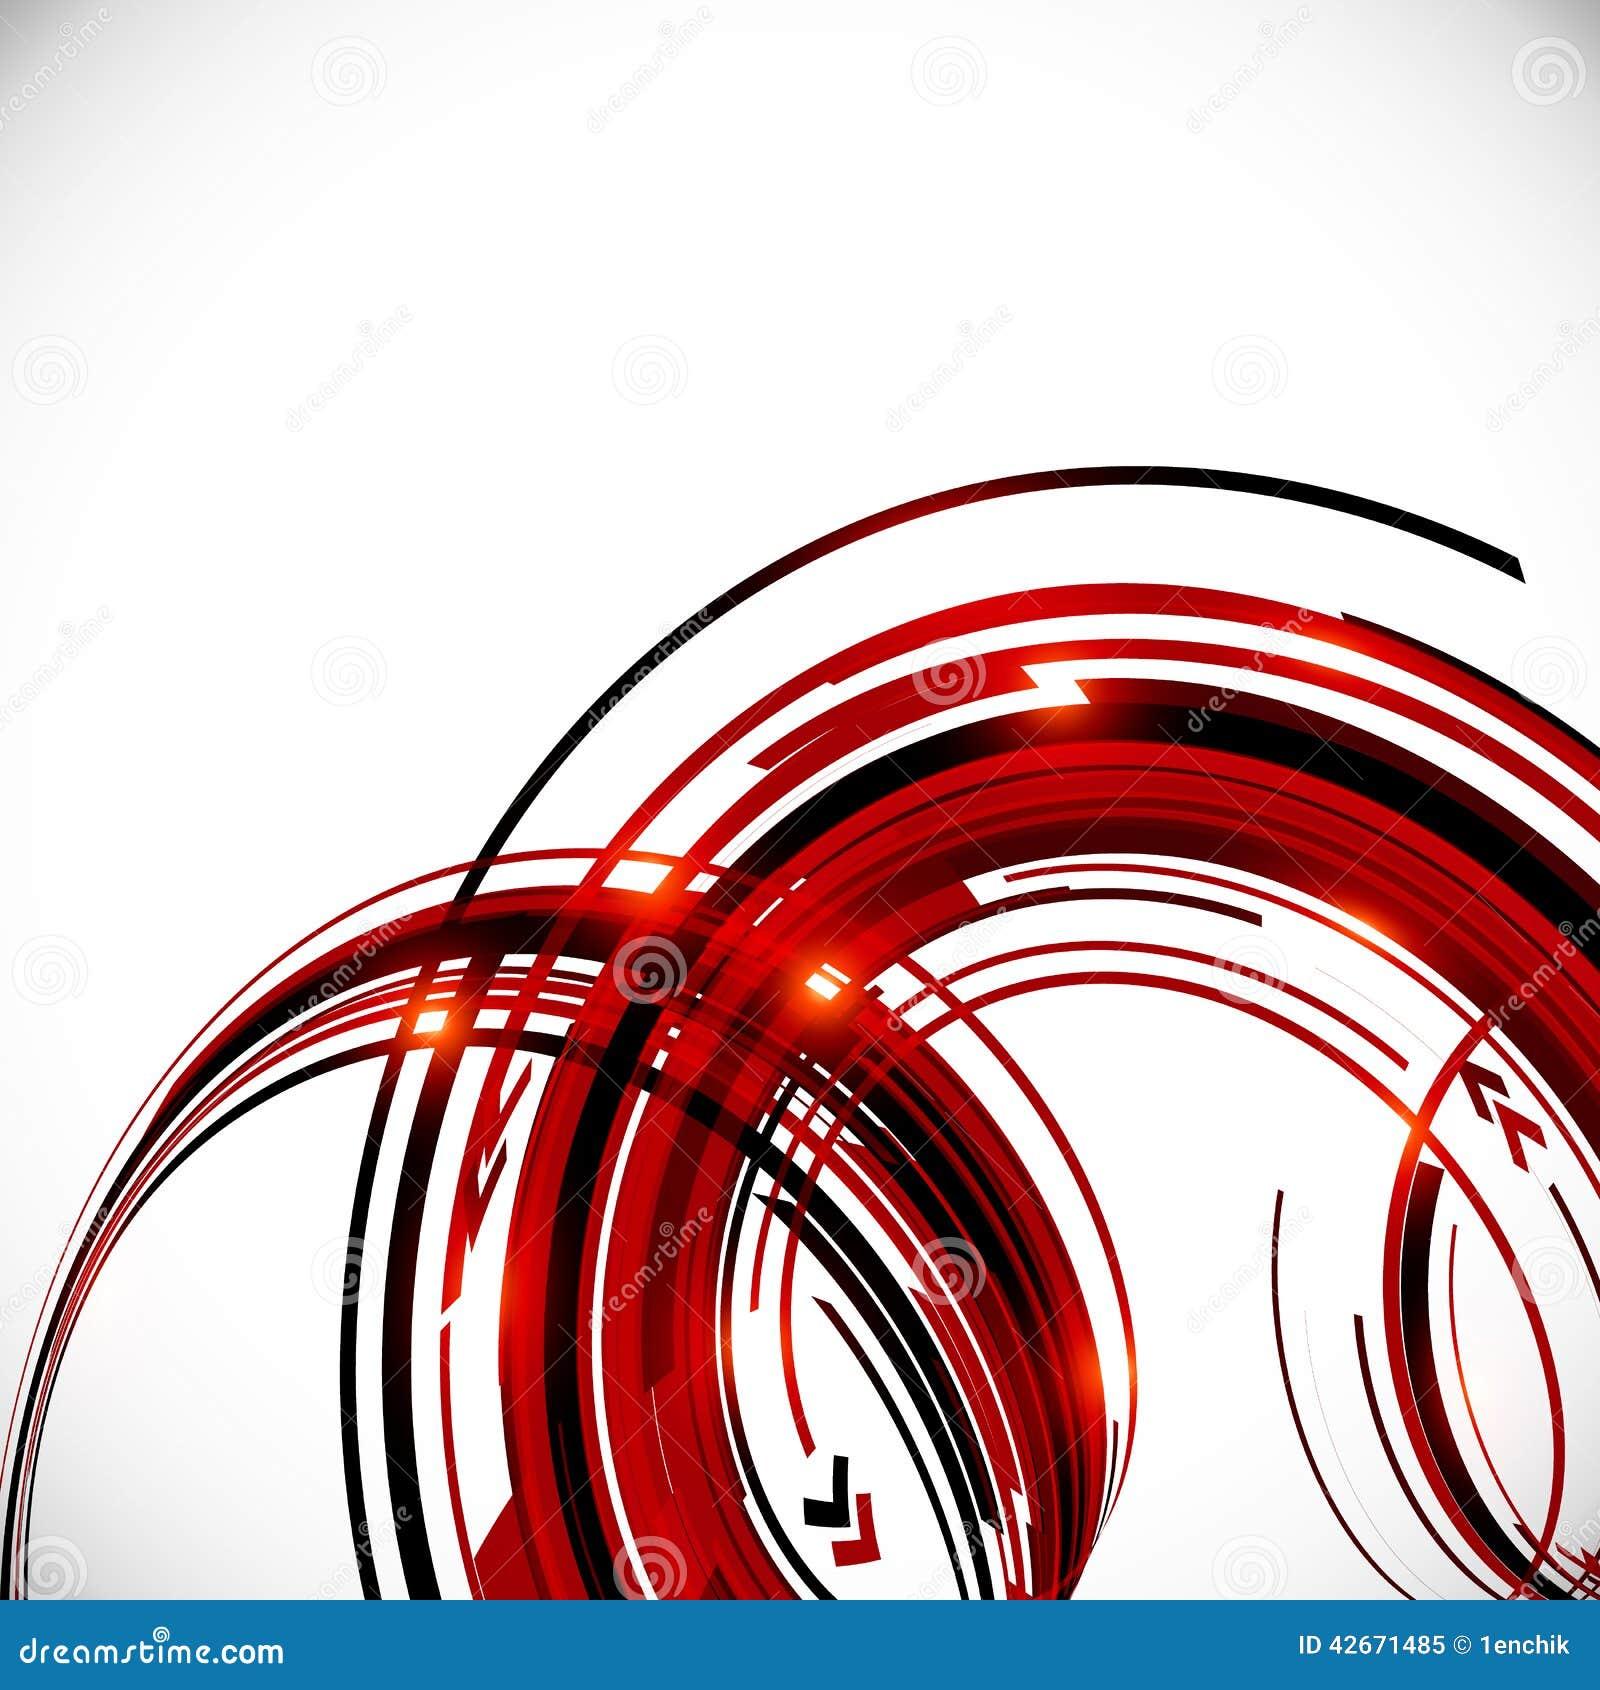 close folder icon 16x16 HhyTZjCy